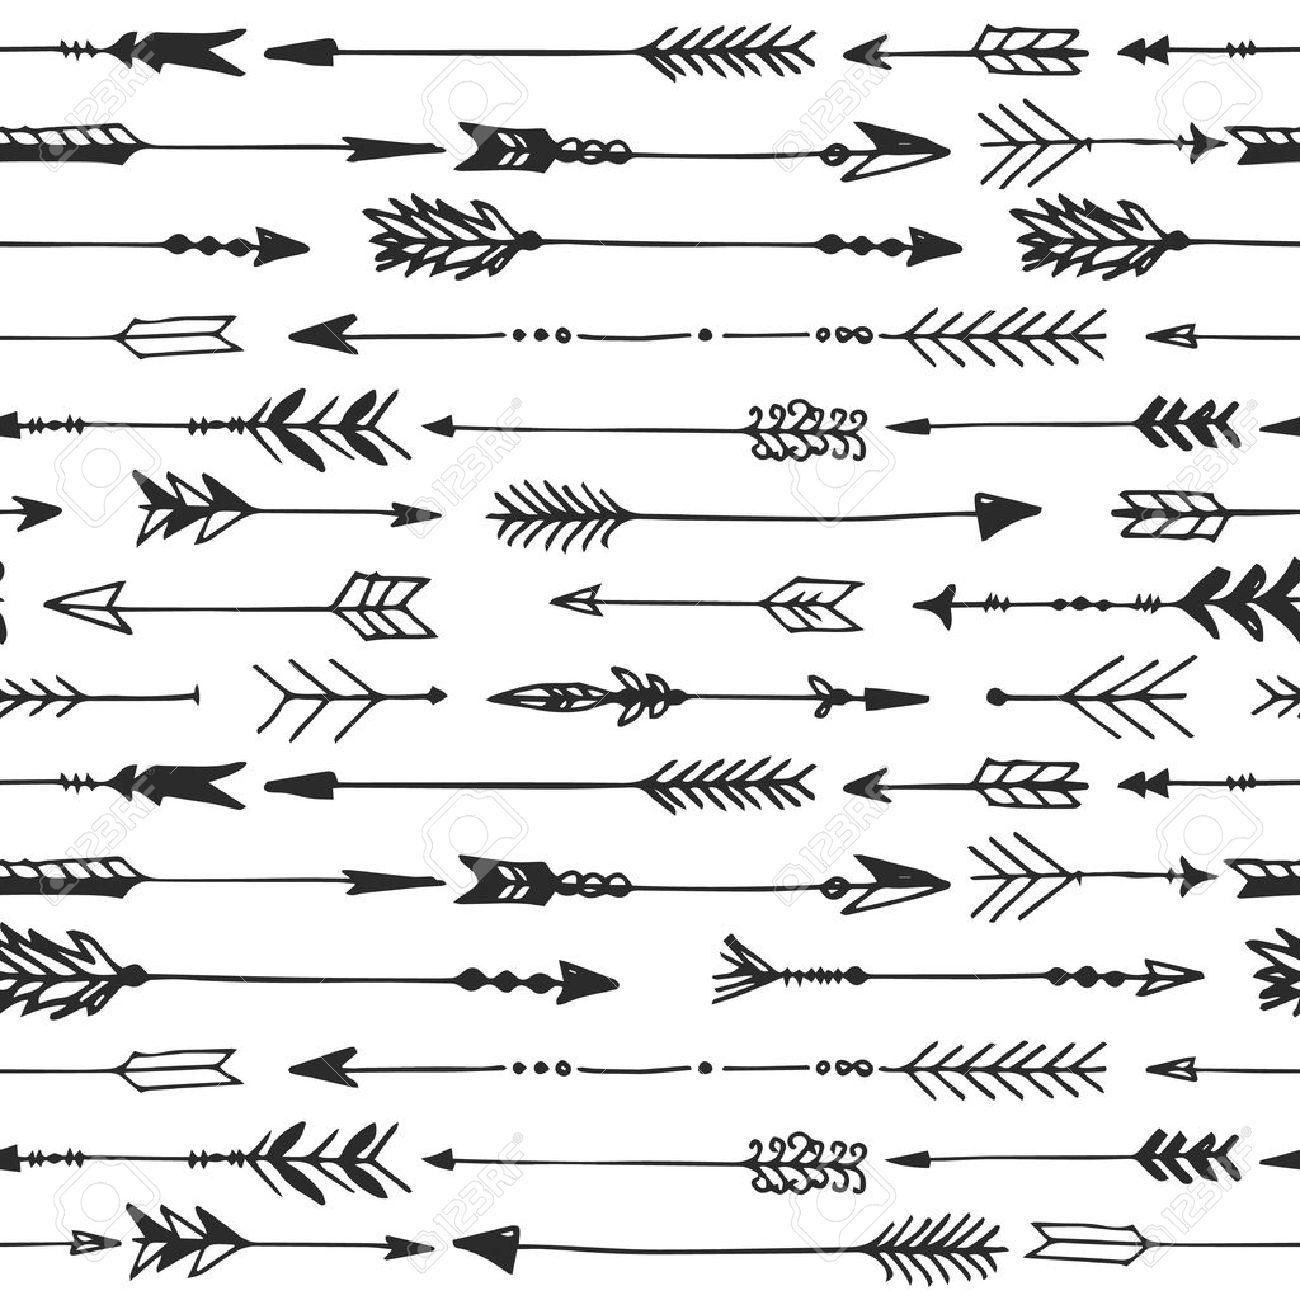 arrow rustic seamless pattern hand drawn vintage vector background rh 123rf com arrow vintage illustration vector Vintage Arrow Graphic